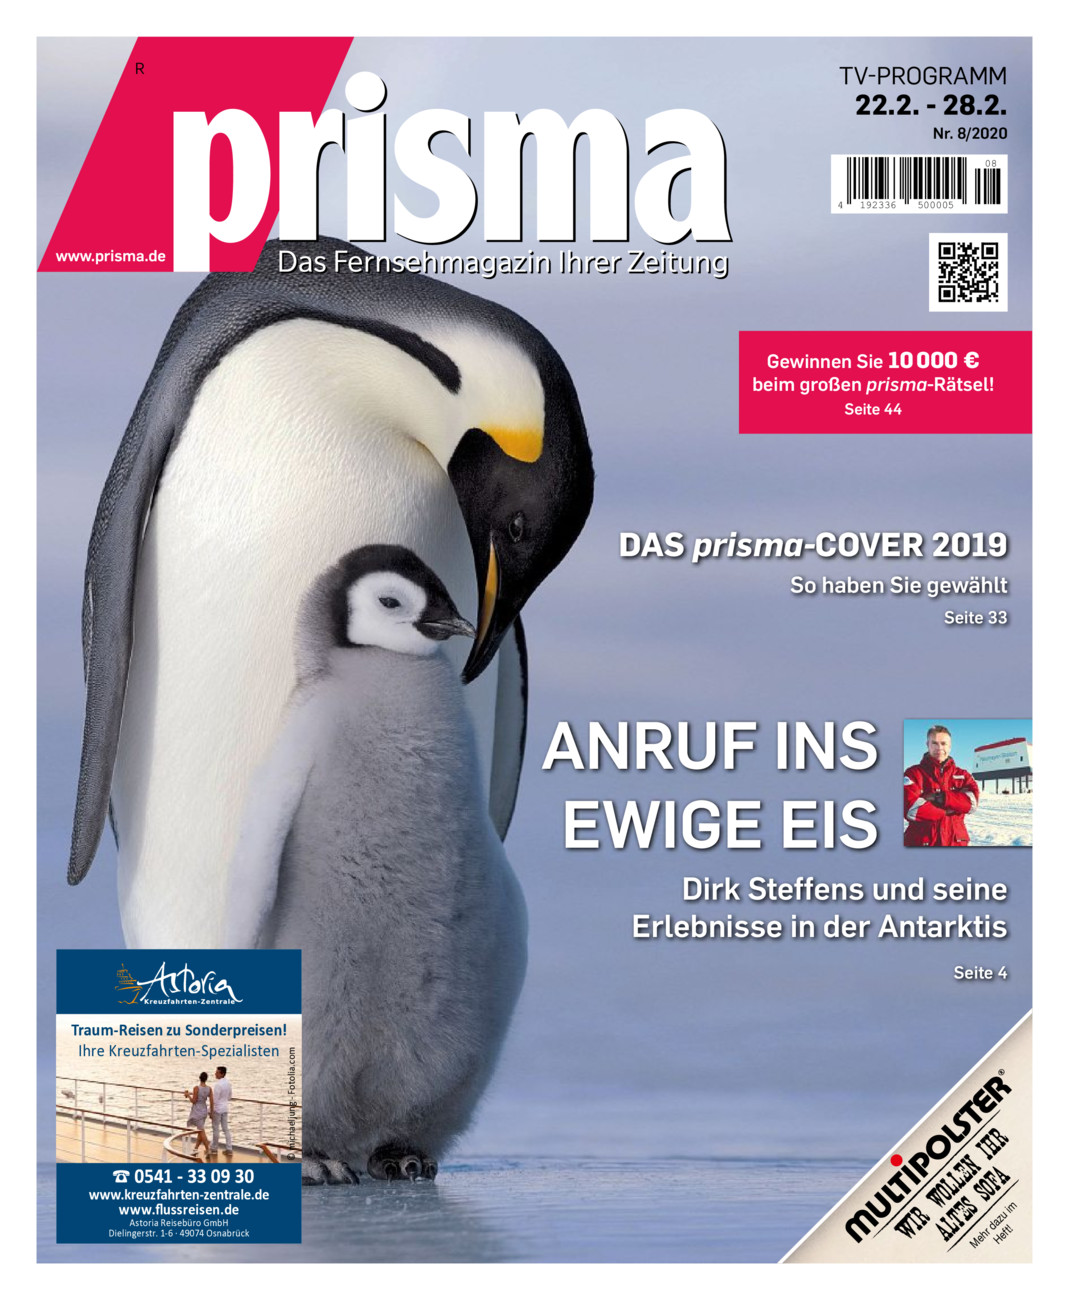 Prisma 22. - 28.2